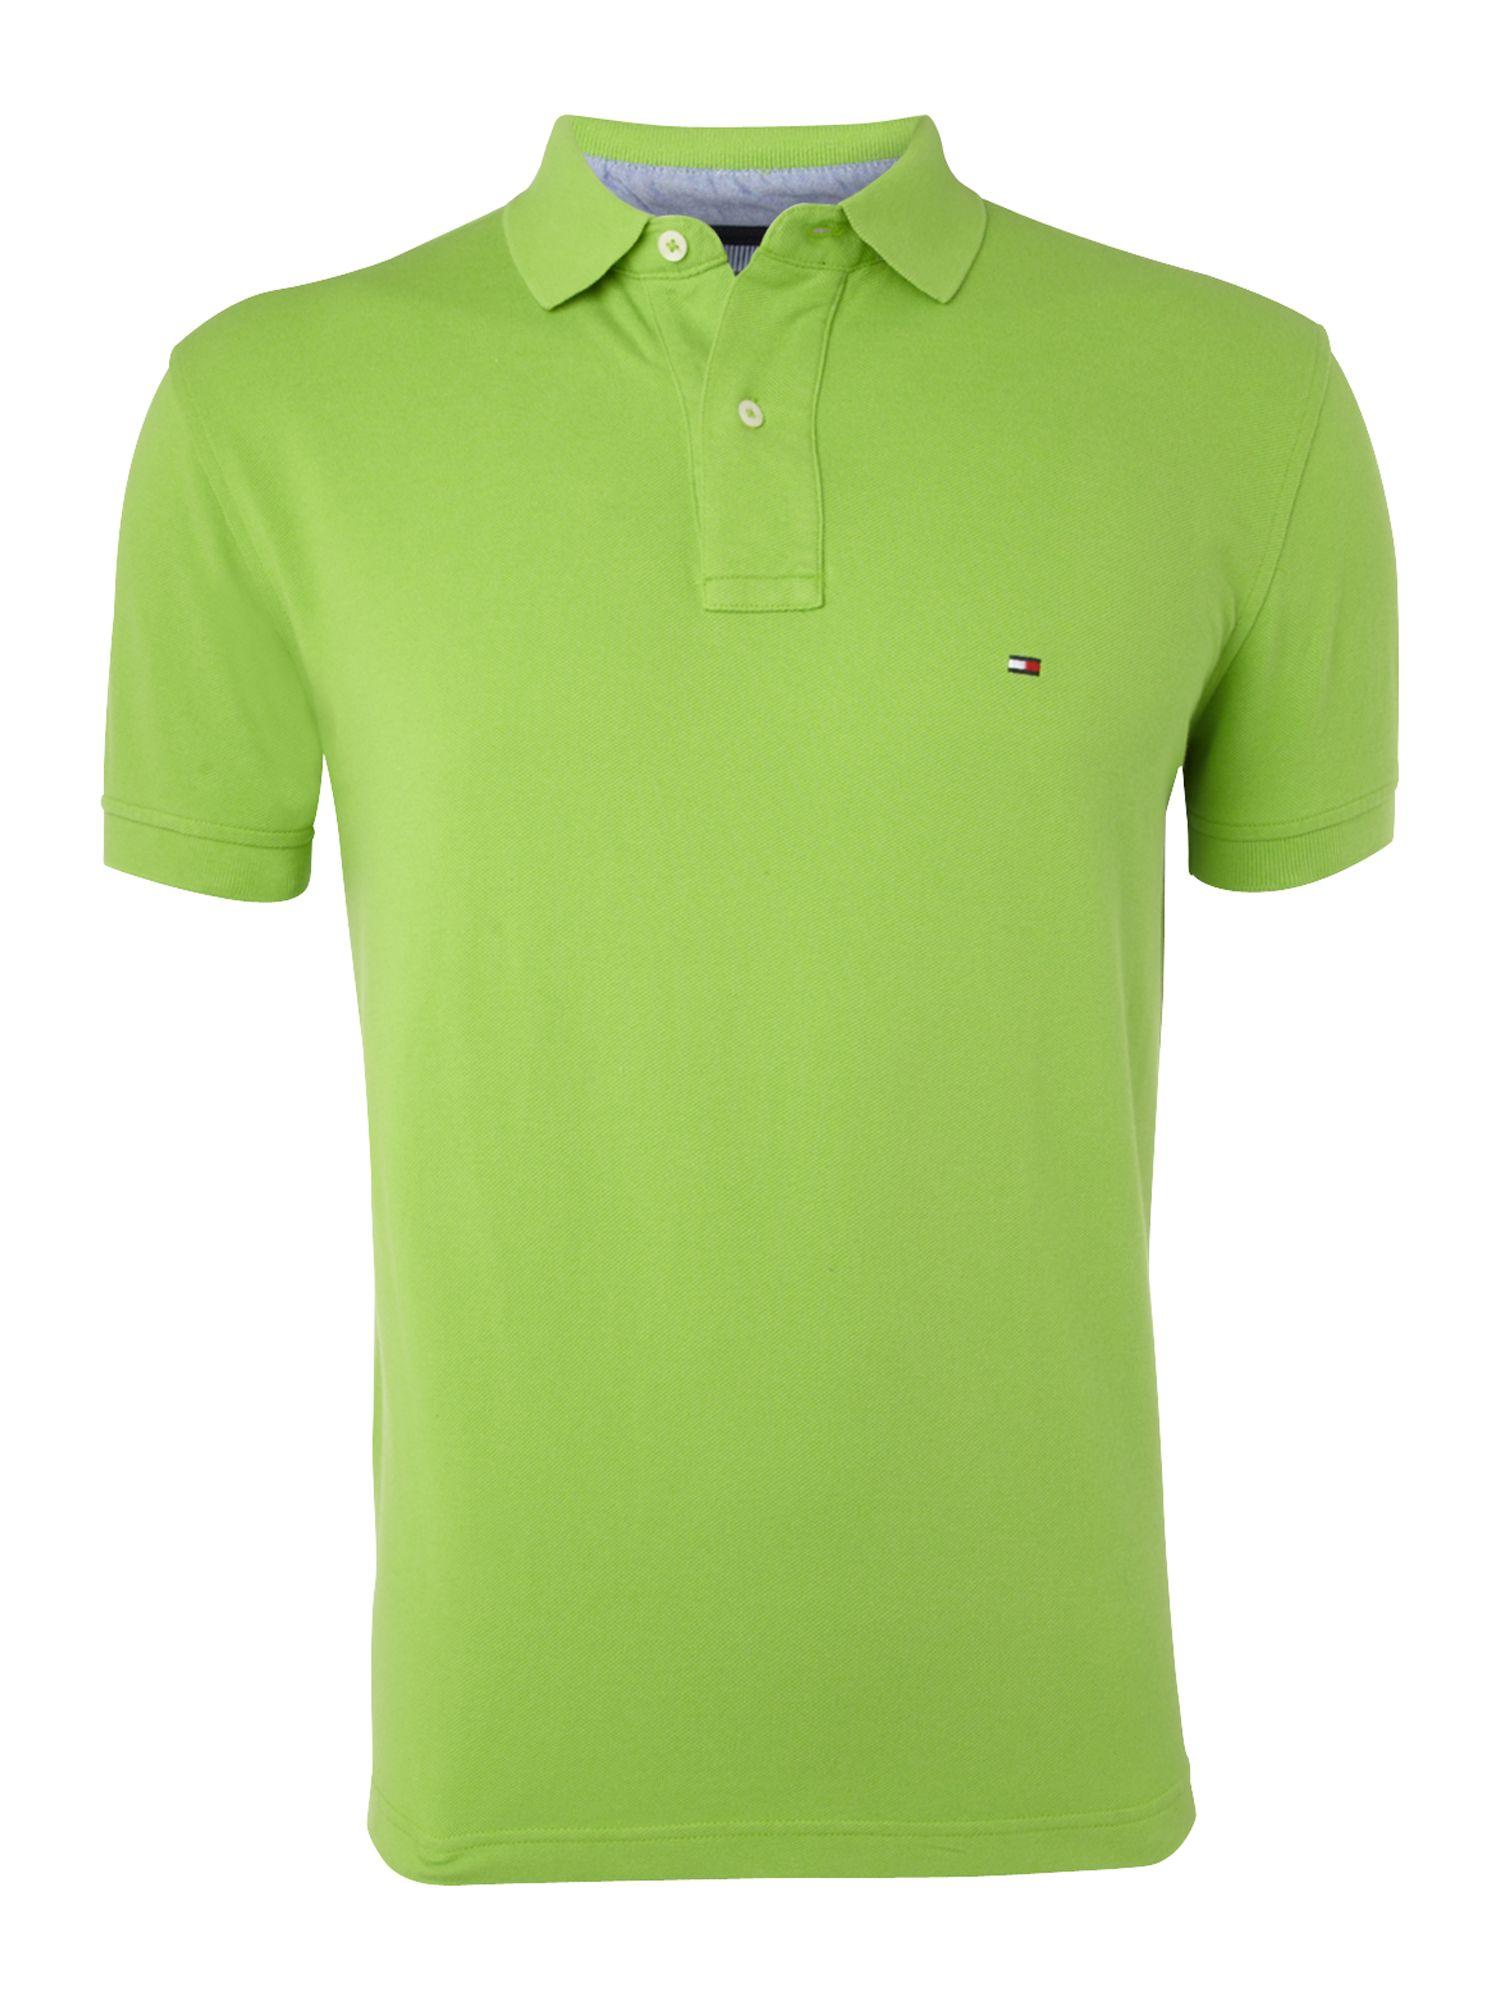 tommy hilfiger shortsleeve polo shirt in green for men lyst. Black Bedroom Furniture Sets. Home Design Ideas